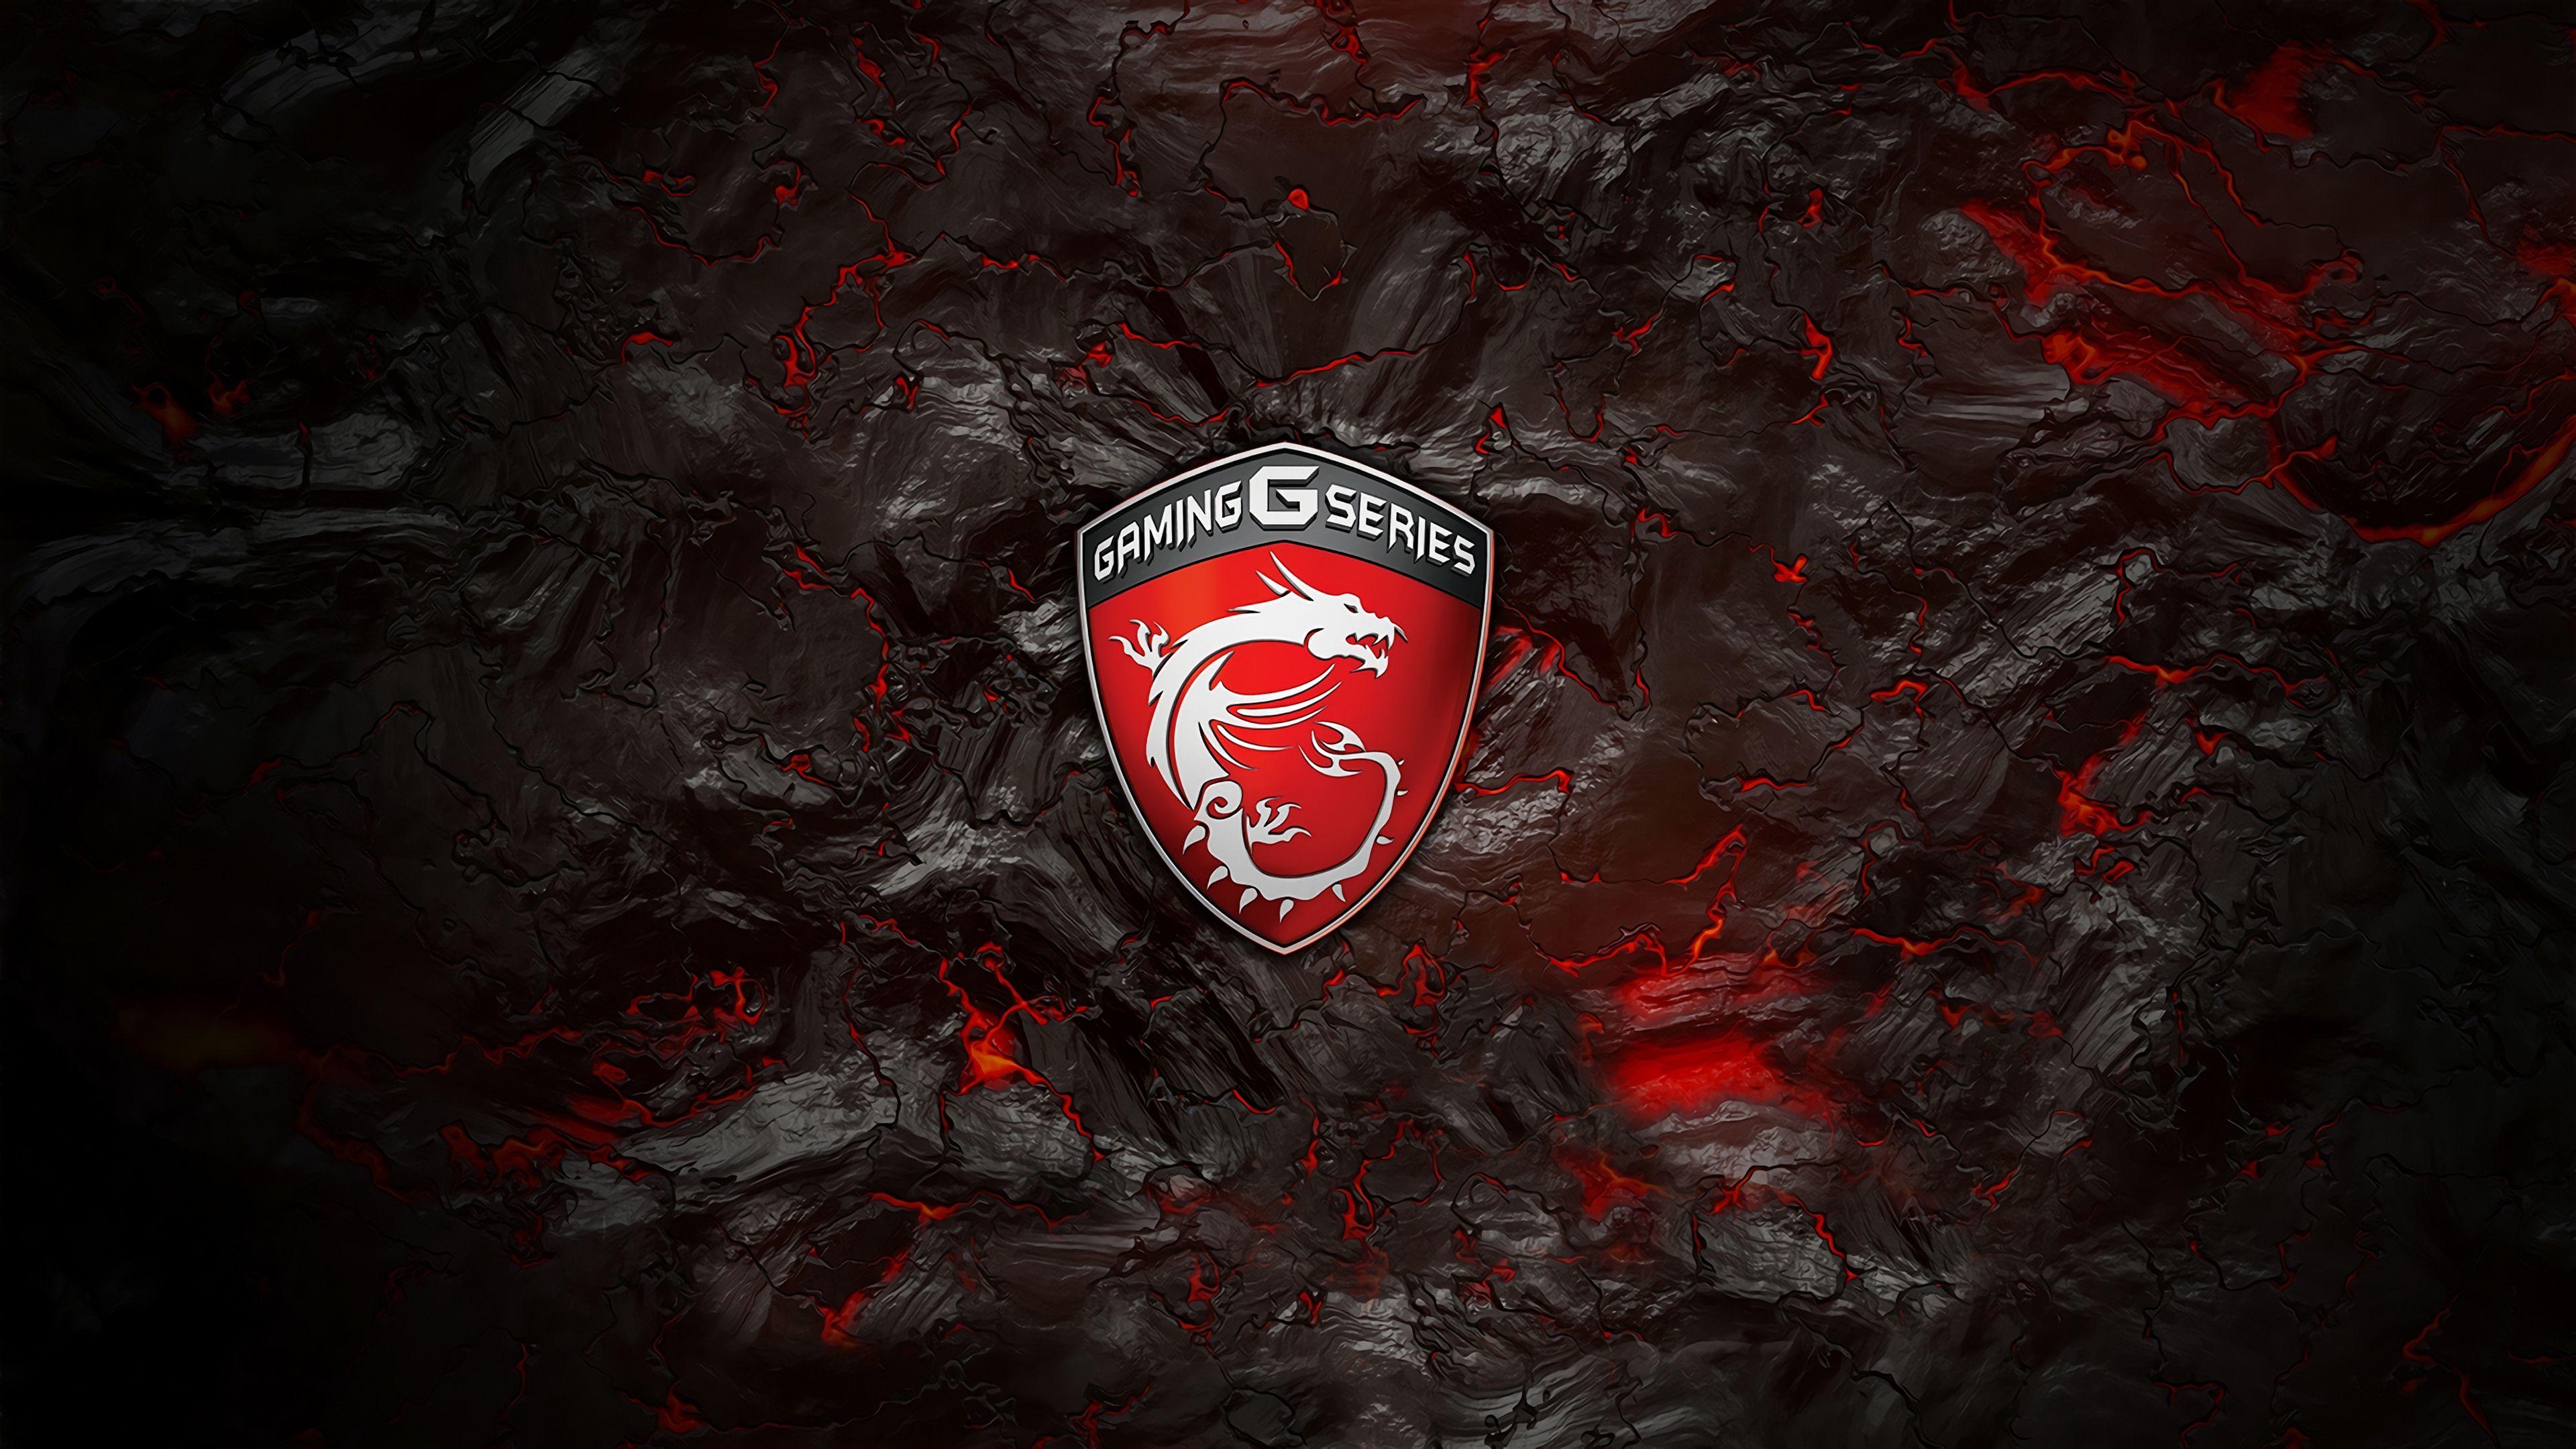 Fondos De Pantalla De Lava: MSI Gaming G Series Logo Lava Background 4k Wallpaper